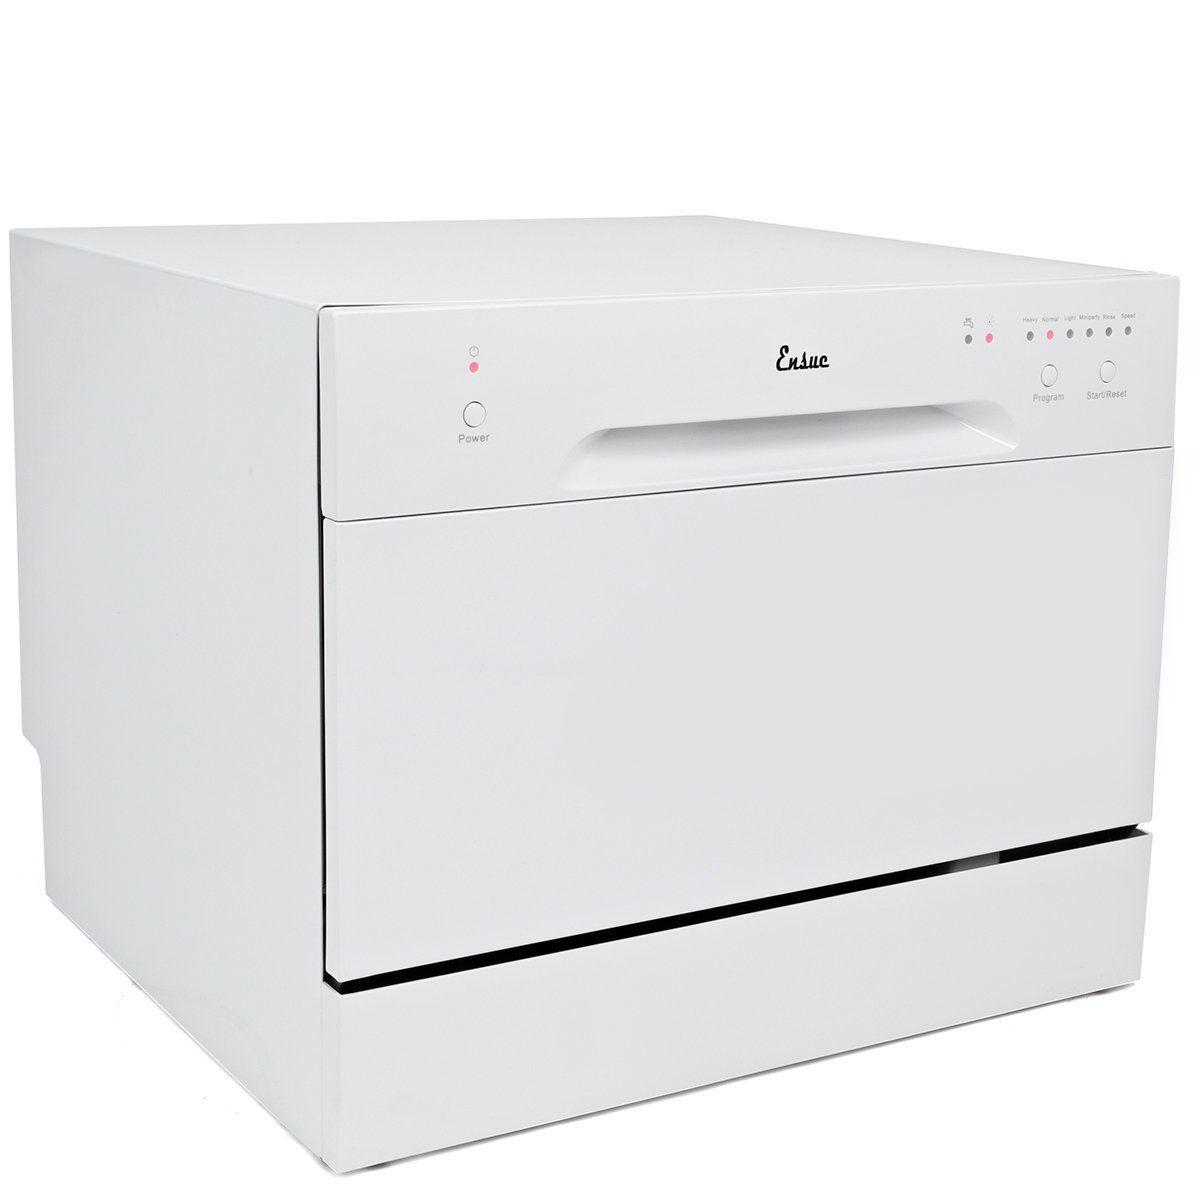 Ensue Countertop Dishwasher Portable Compact Dishwashing Machine